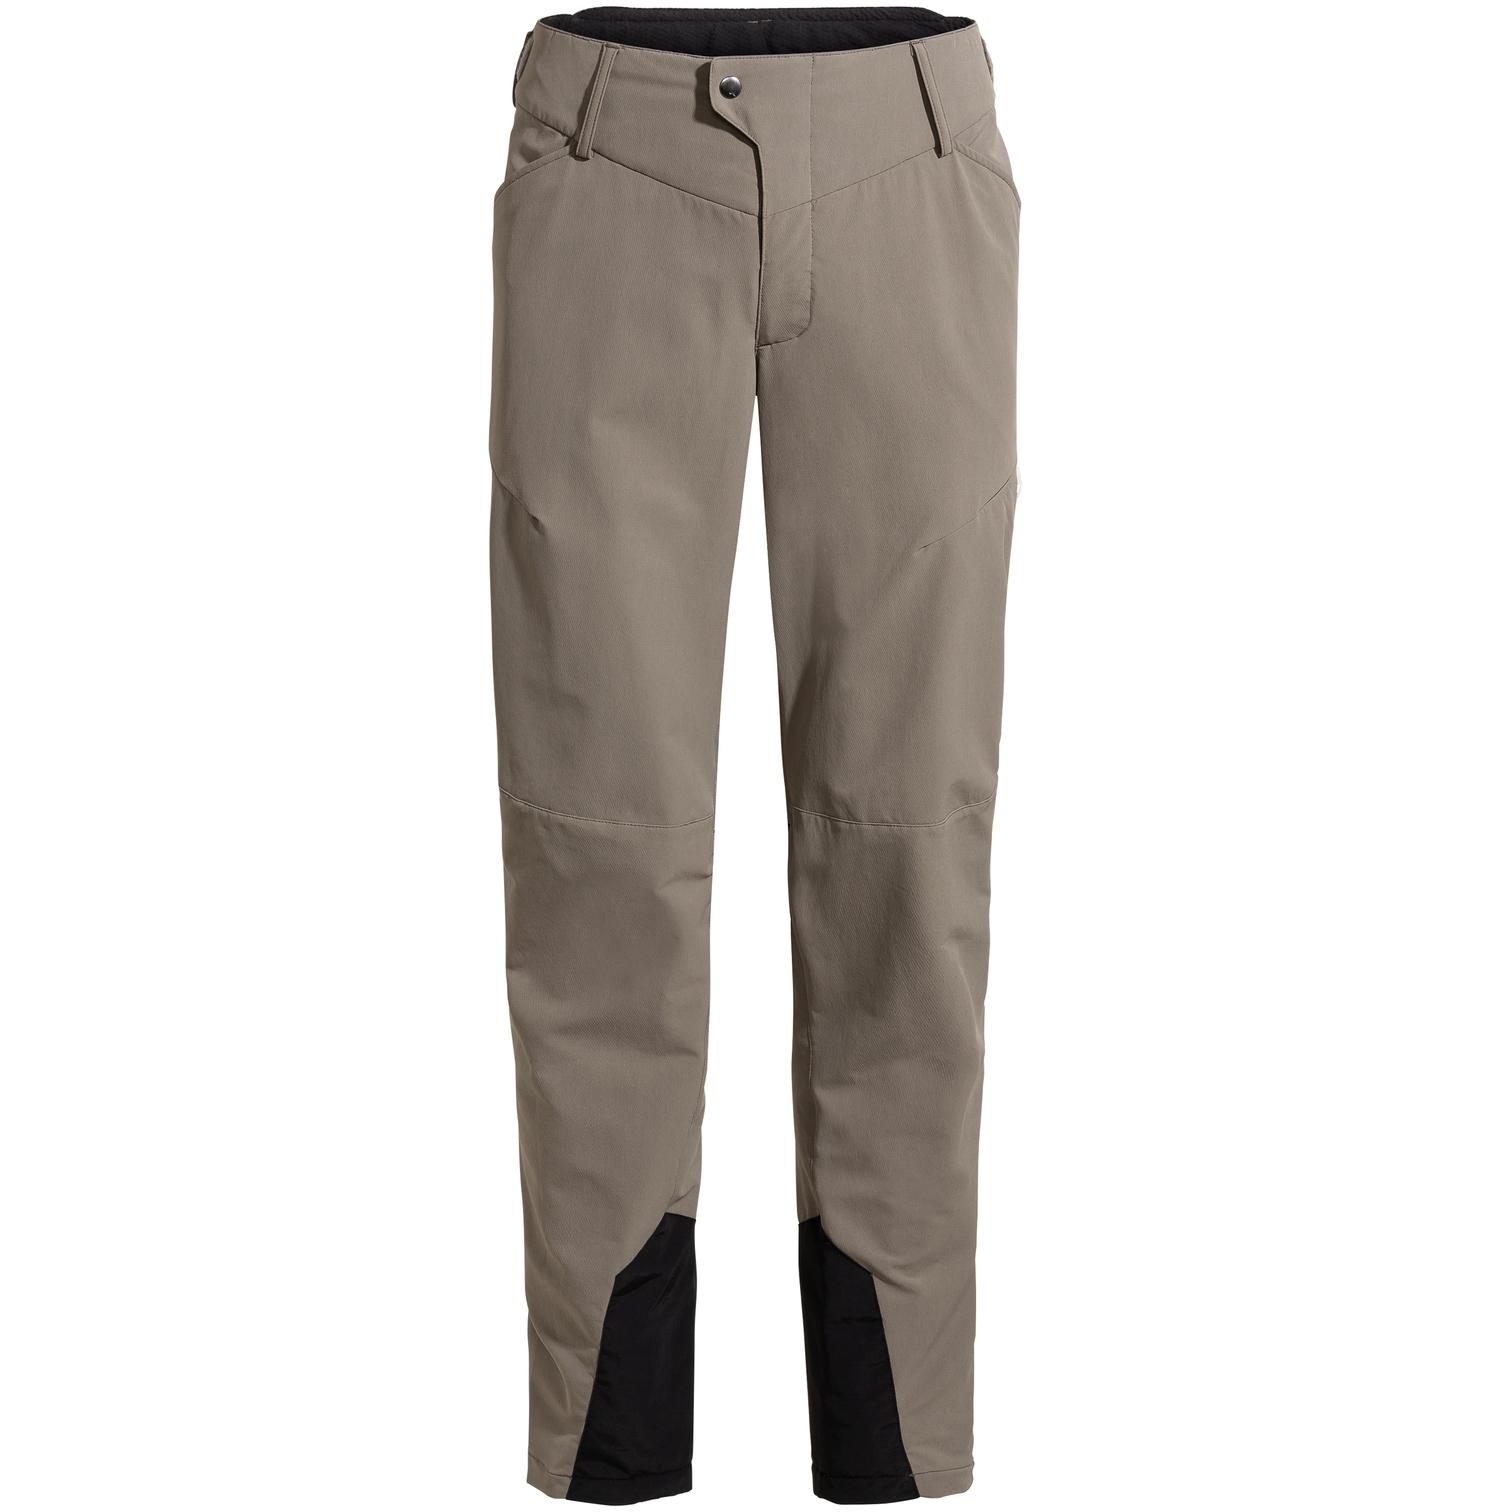 Vaude Men's Qimsa Light Softshell Pants - coconut